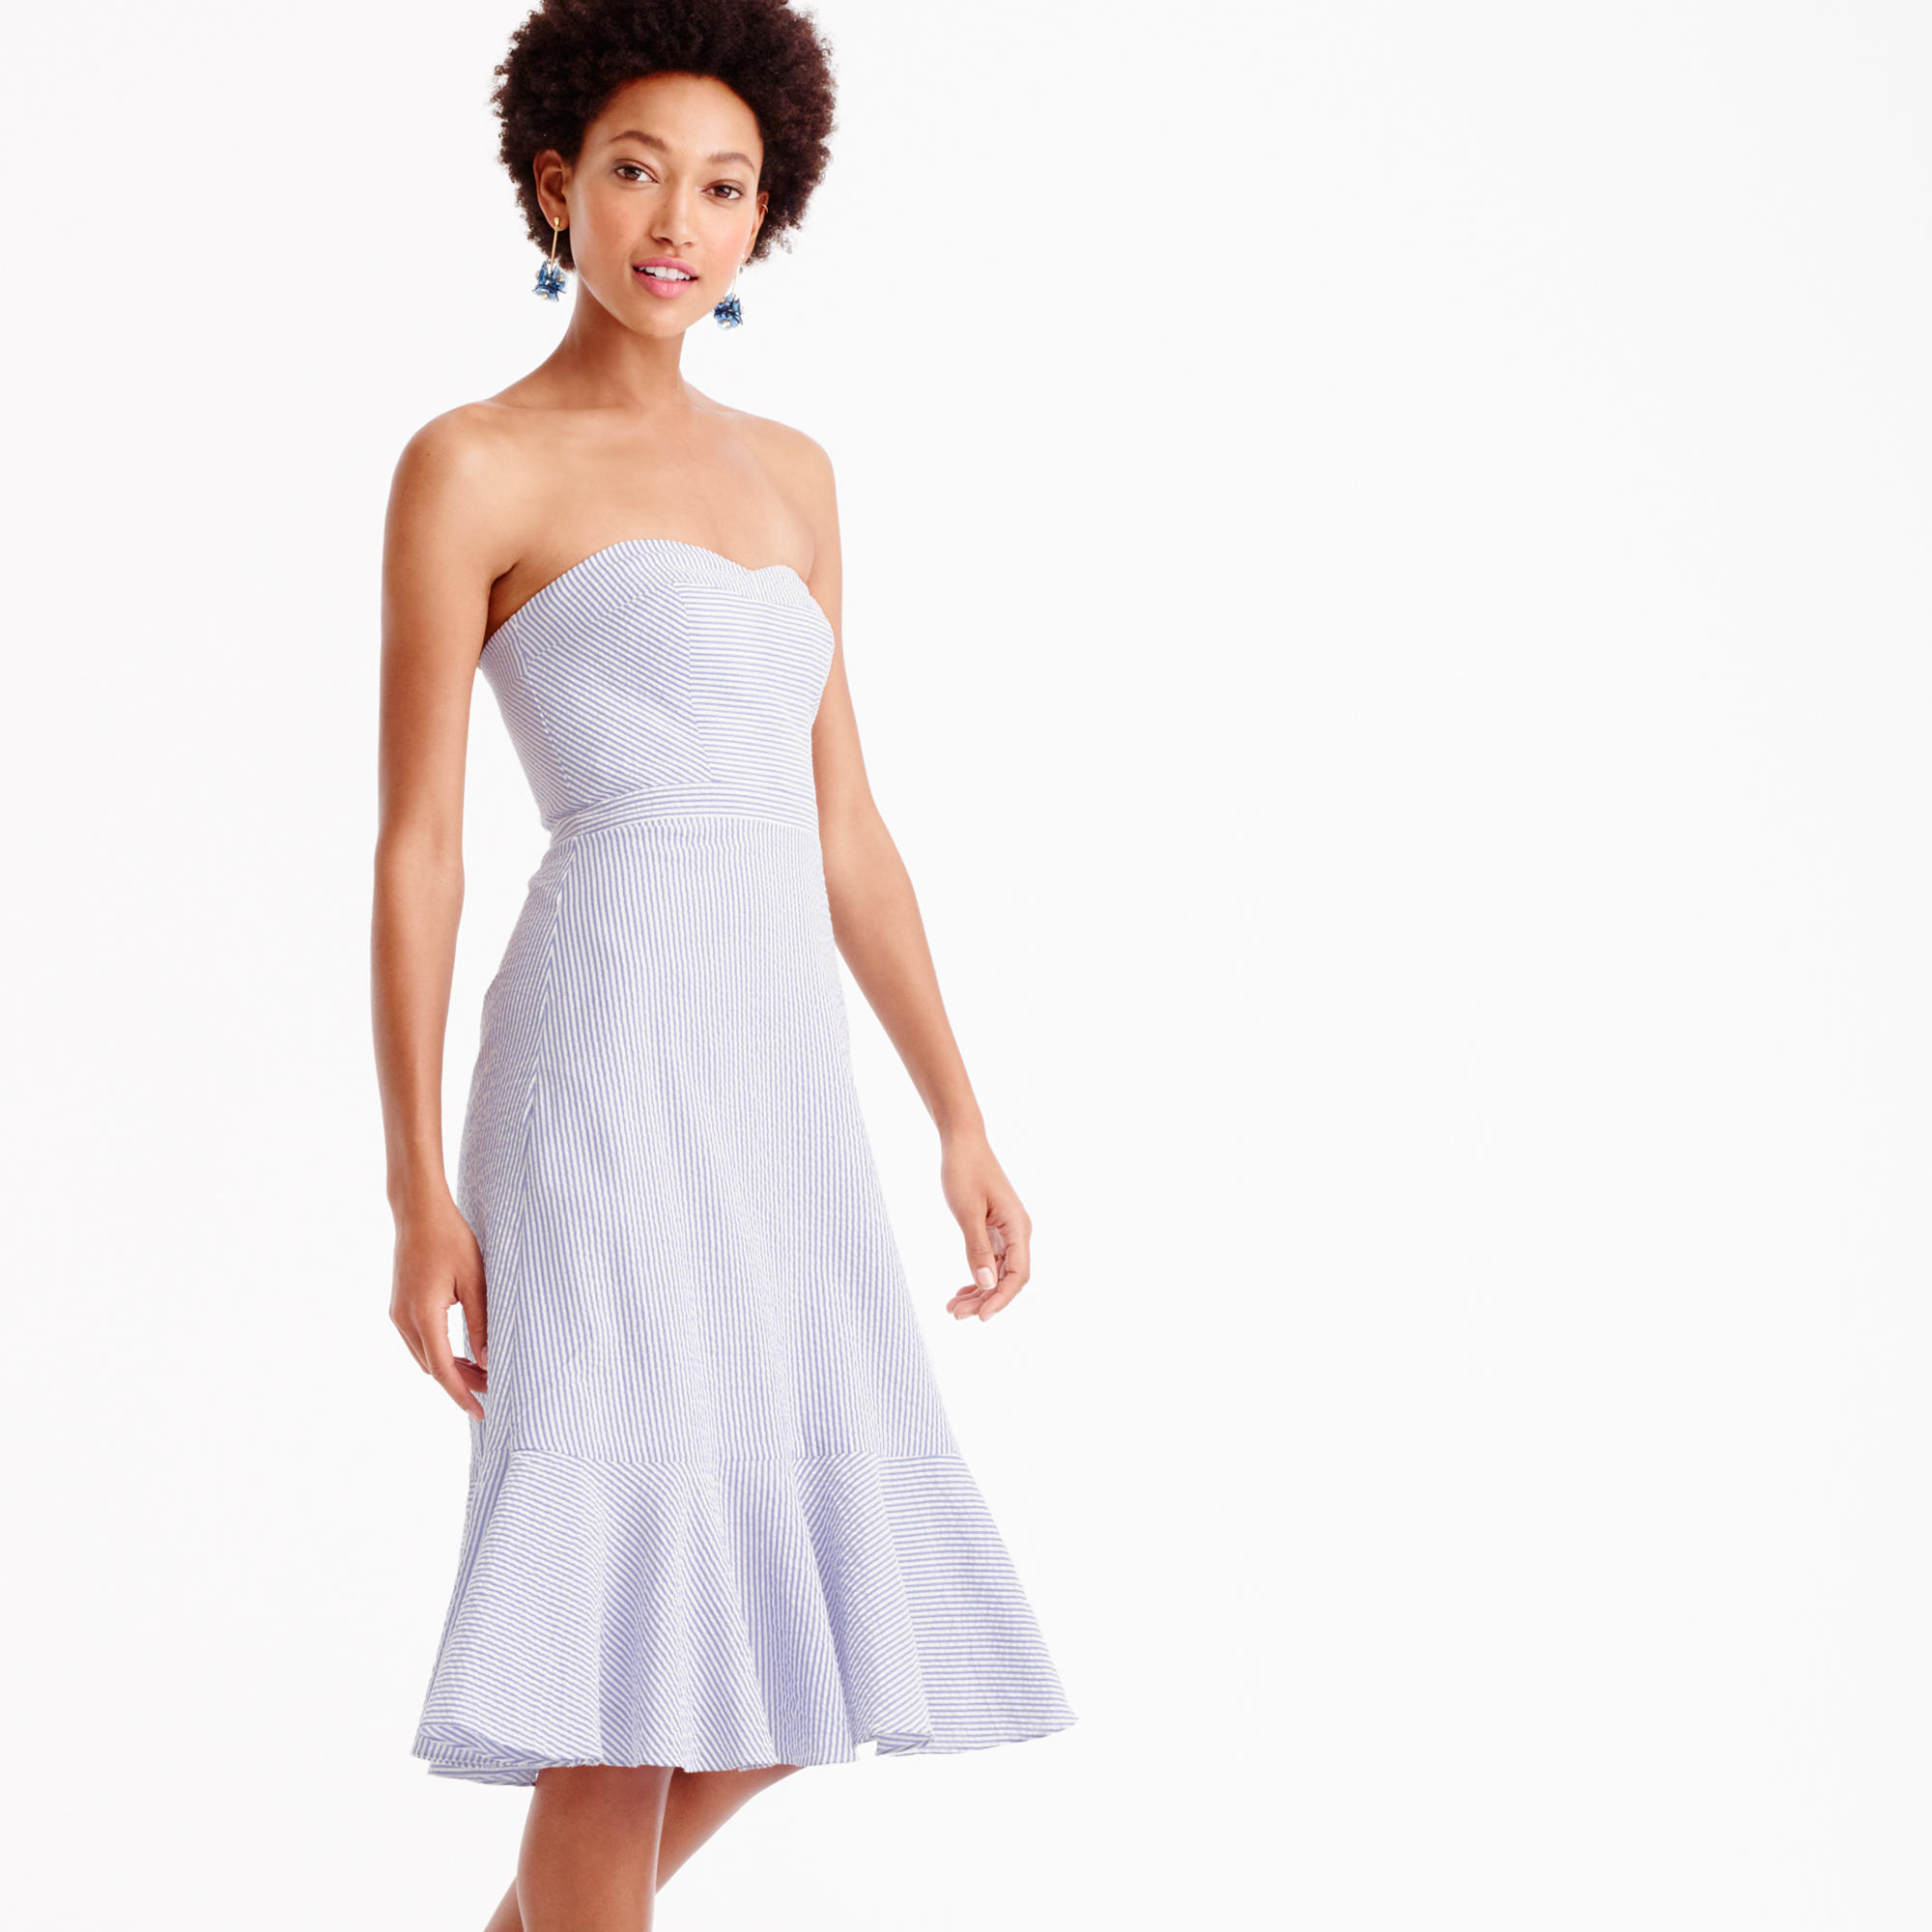 Christmas wedding dress jcrew - Tall Strapless Ruffle Hem Dress In Seersucker